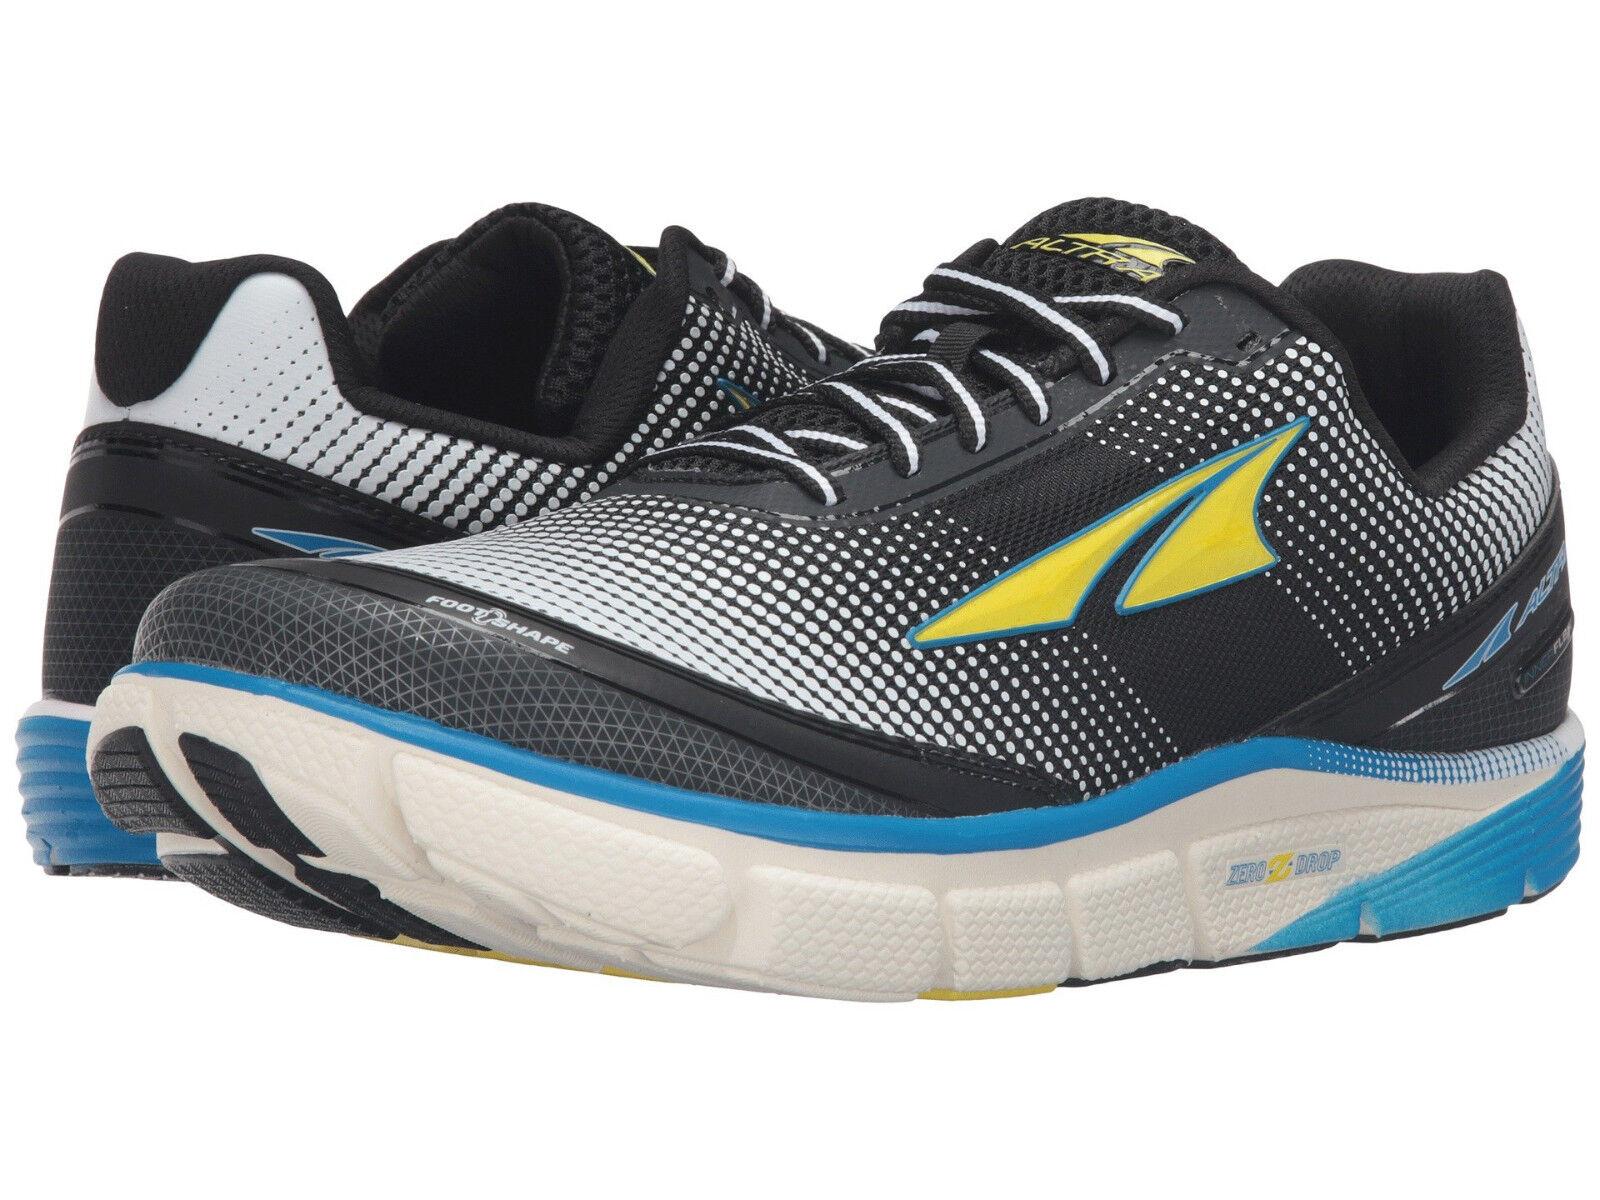 Altra Torin 2.5 Running Shoes, Men's Sizes 10-12 Medium, Blue / Yellow, NEW